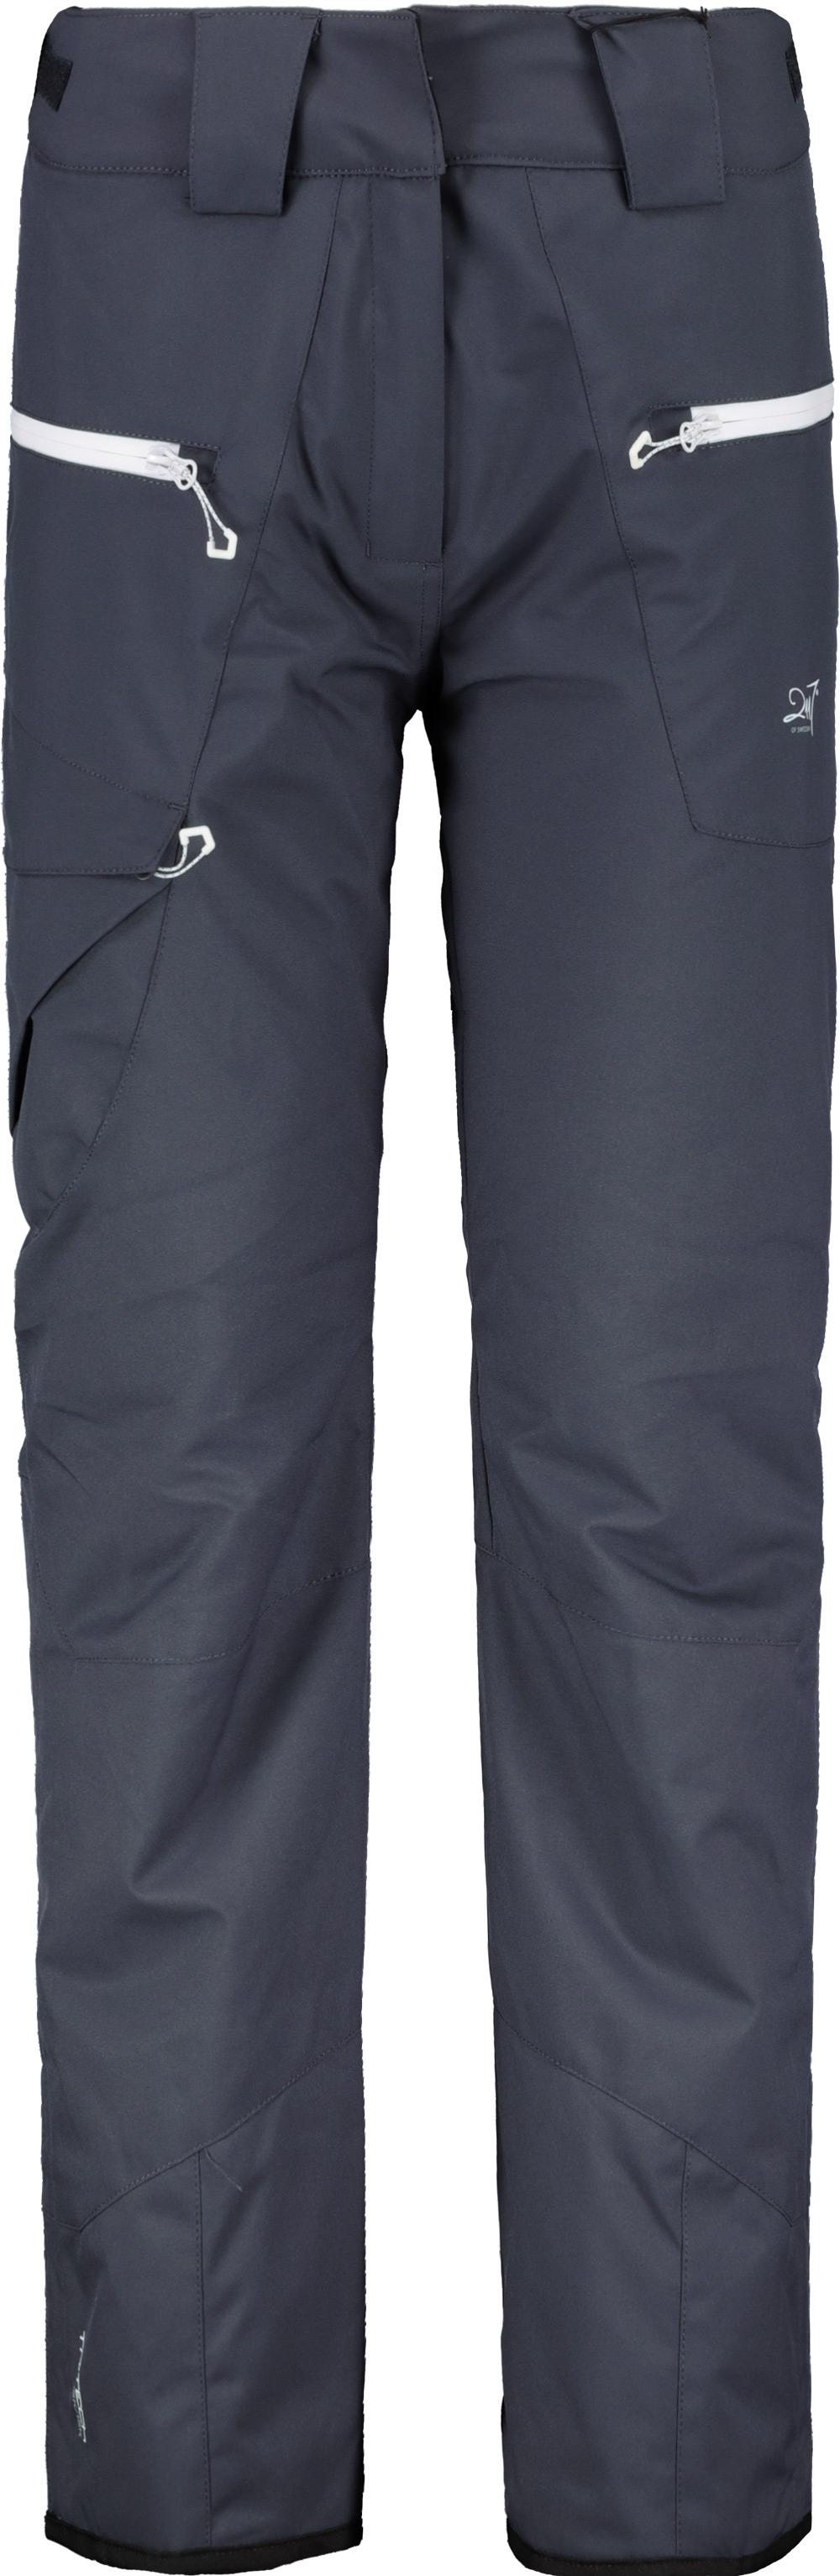 Kalhoty lyžařské pánské 2117 GRYTNAS